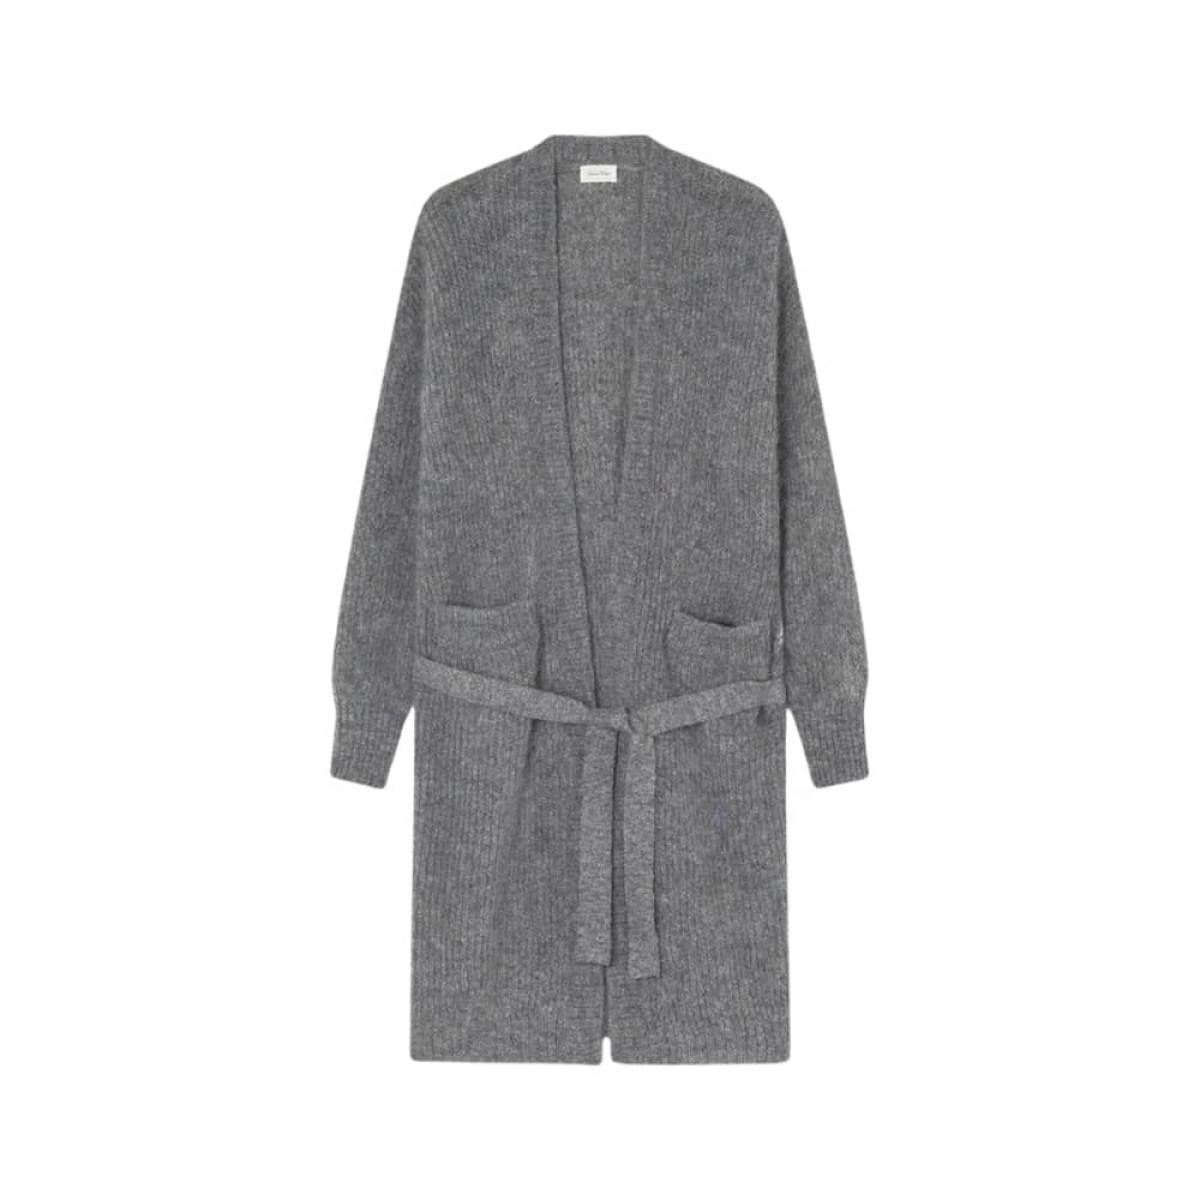 rozy cardigan - heather grey